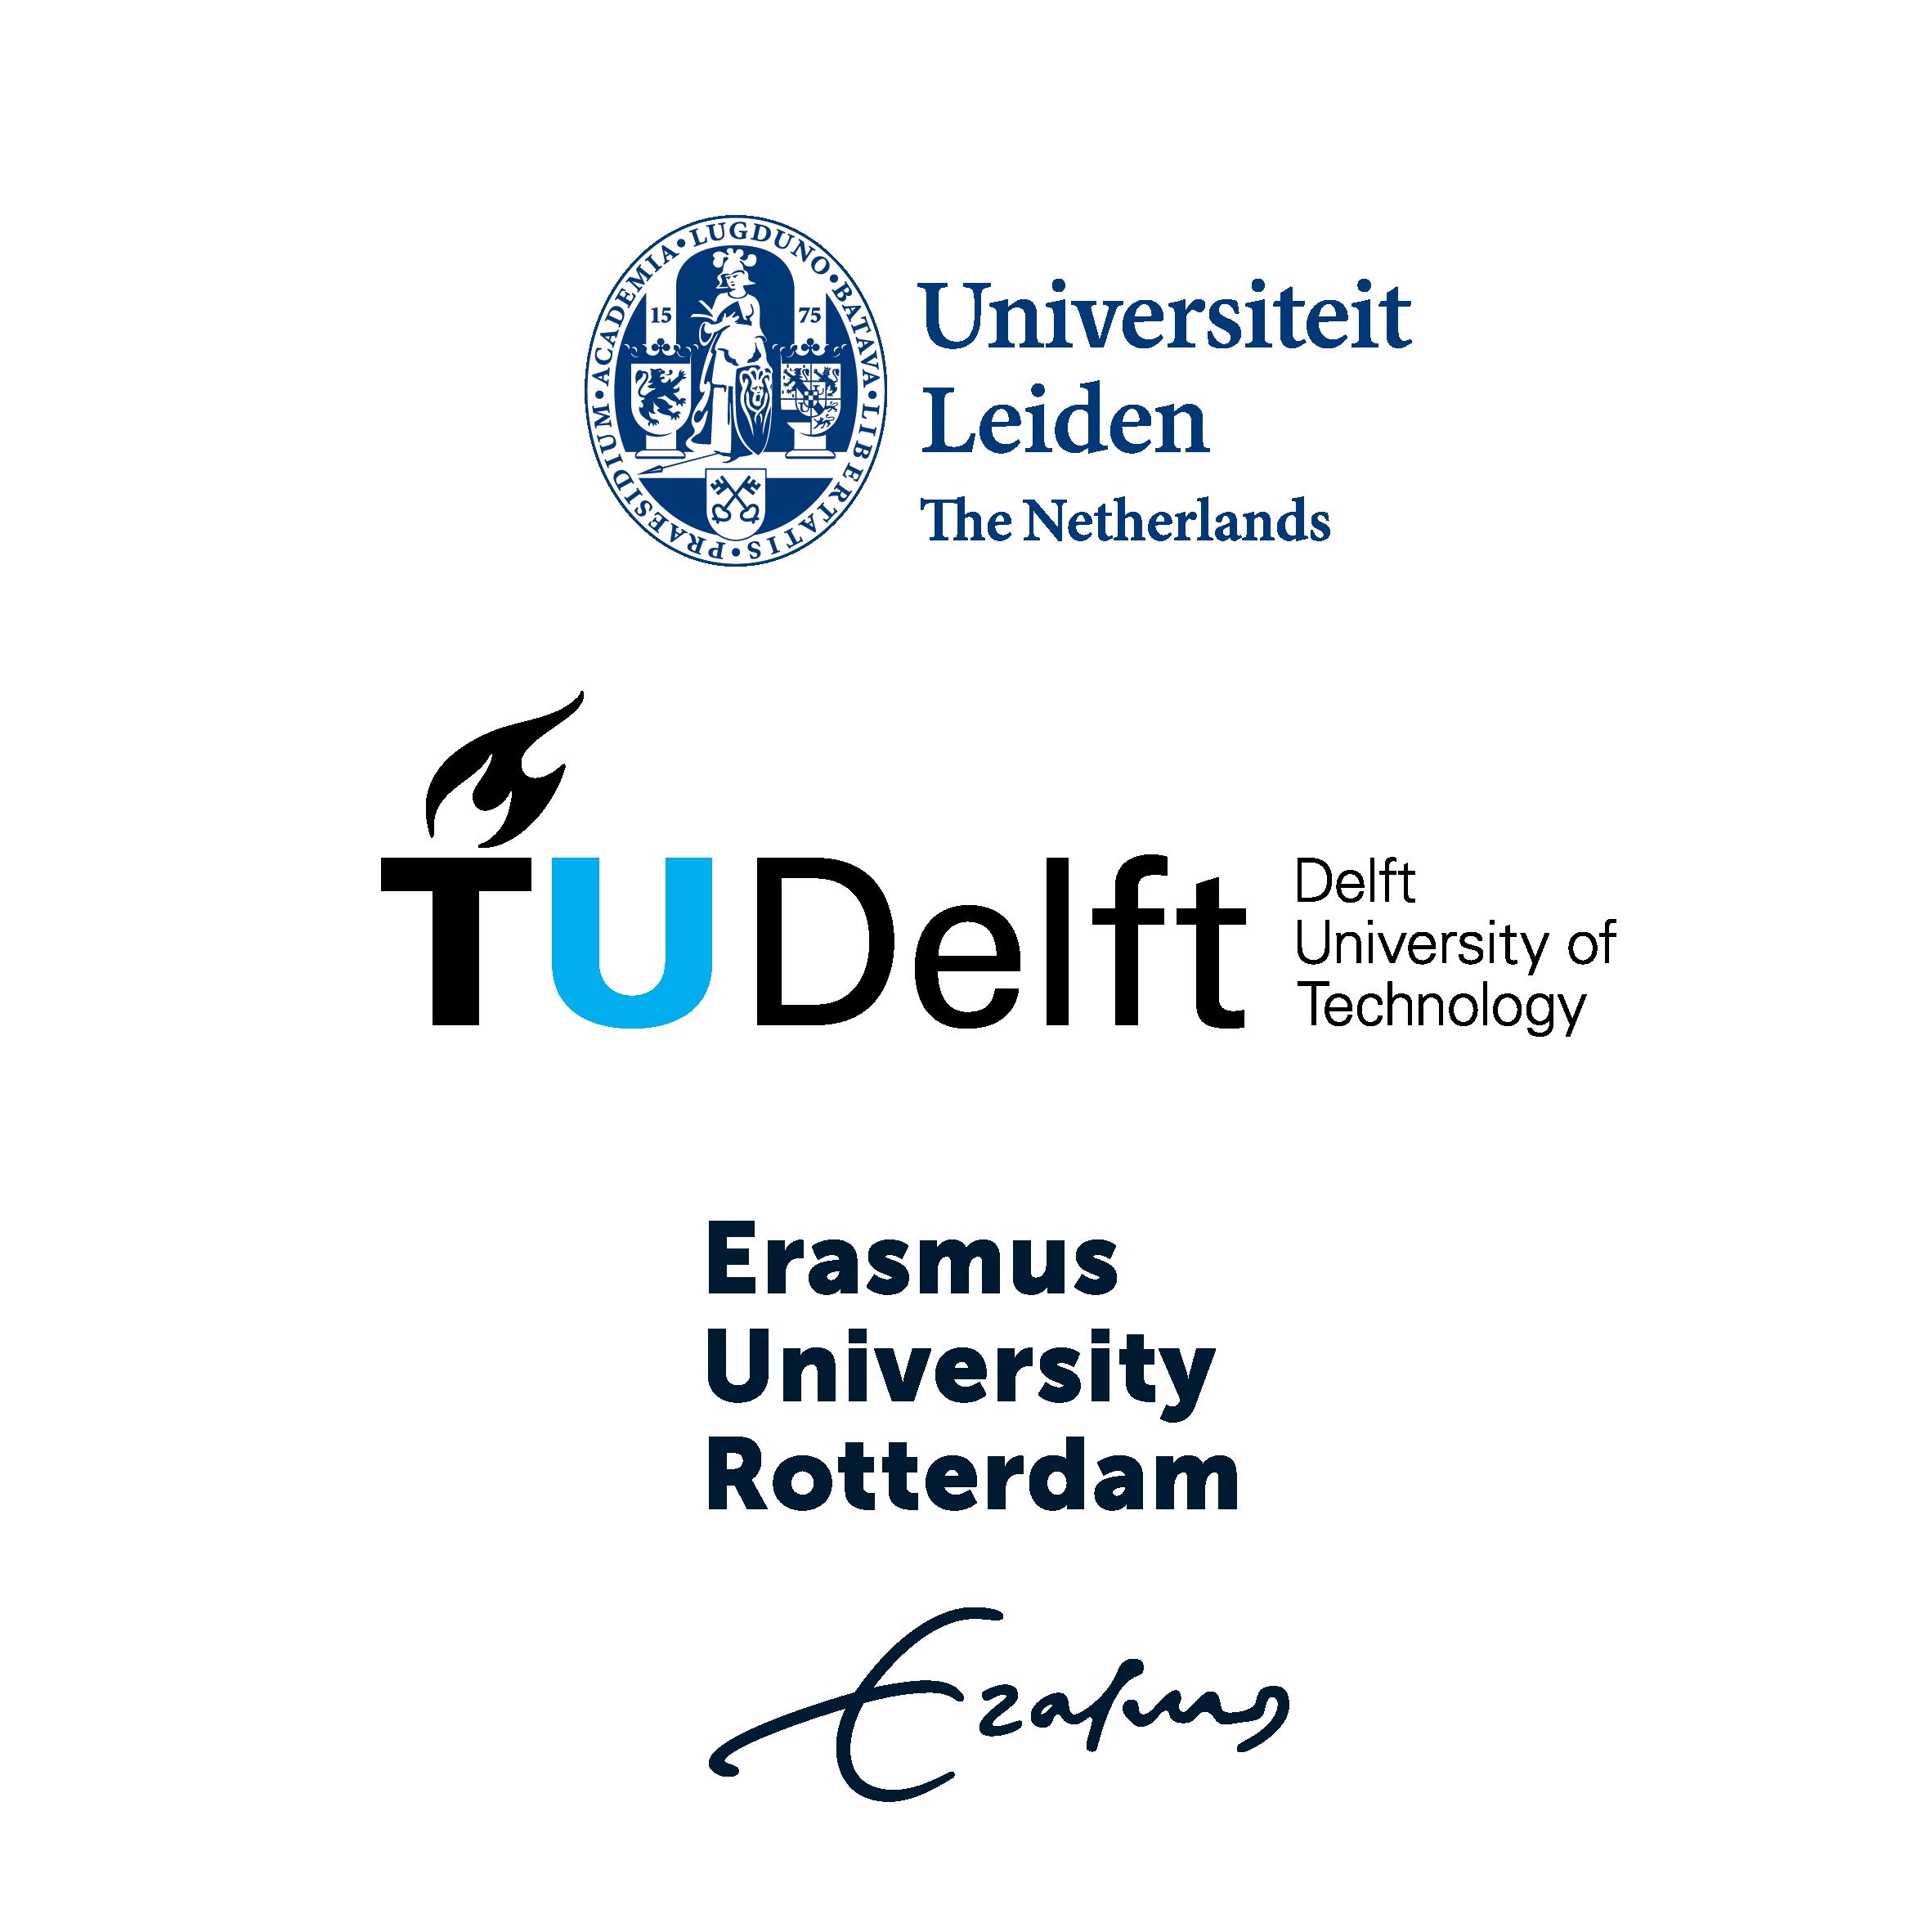 Leiden Delft Erasmus logo DigiEduHack vertical-01.png